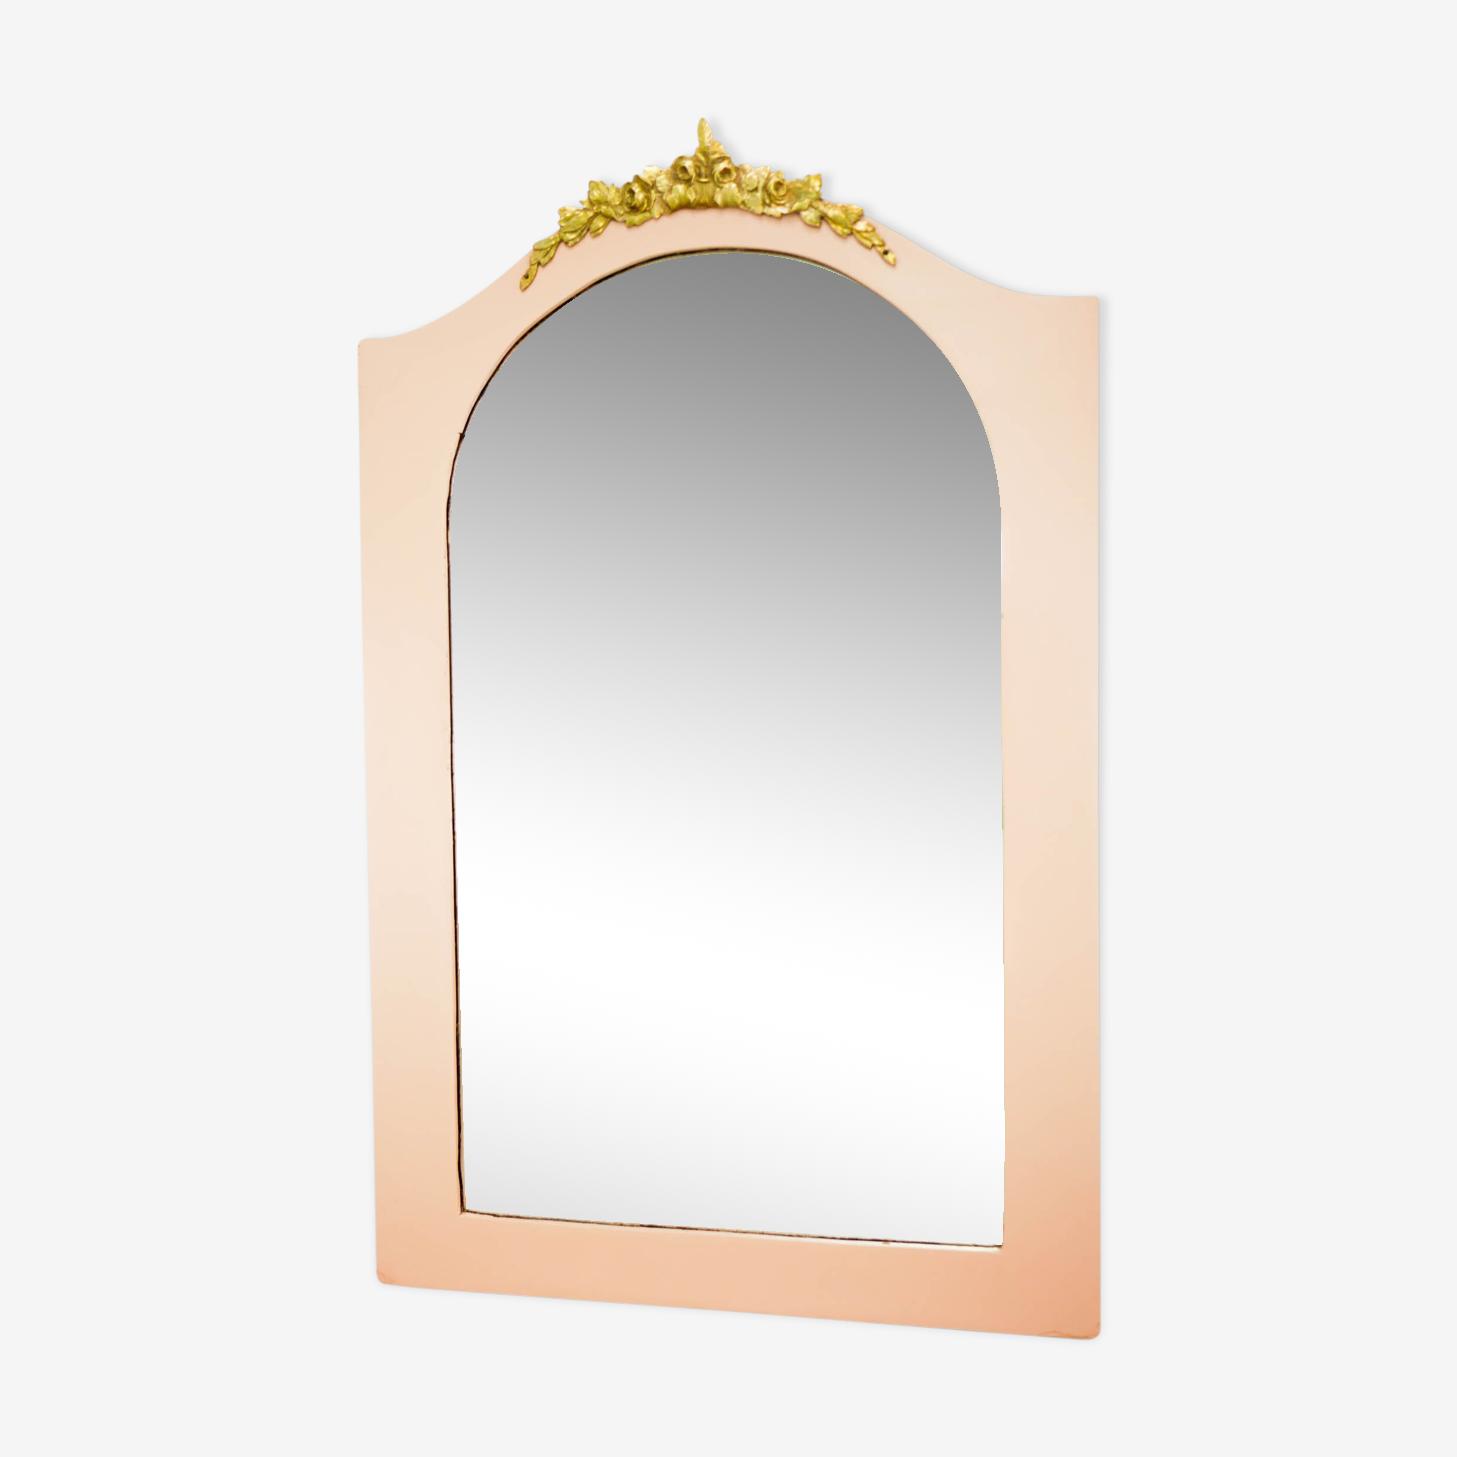 Art deco mirror 99x62cm